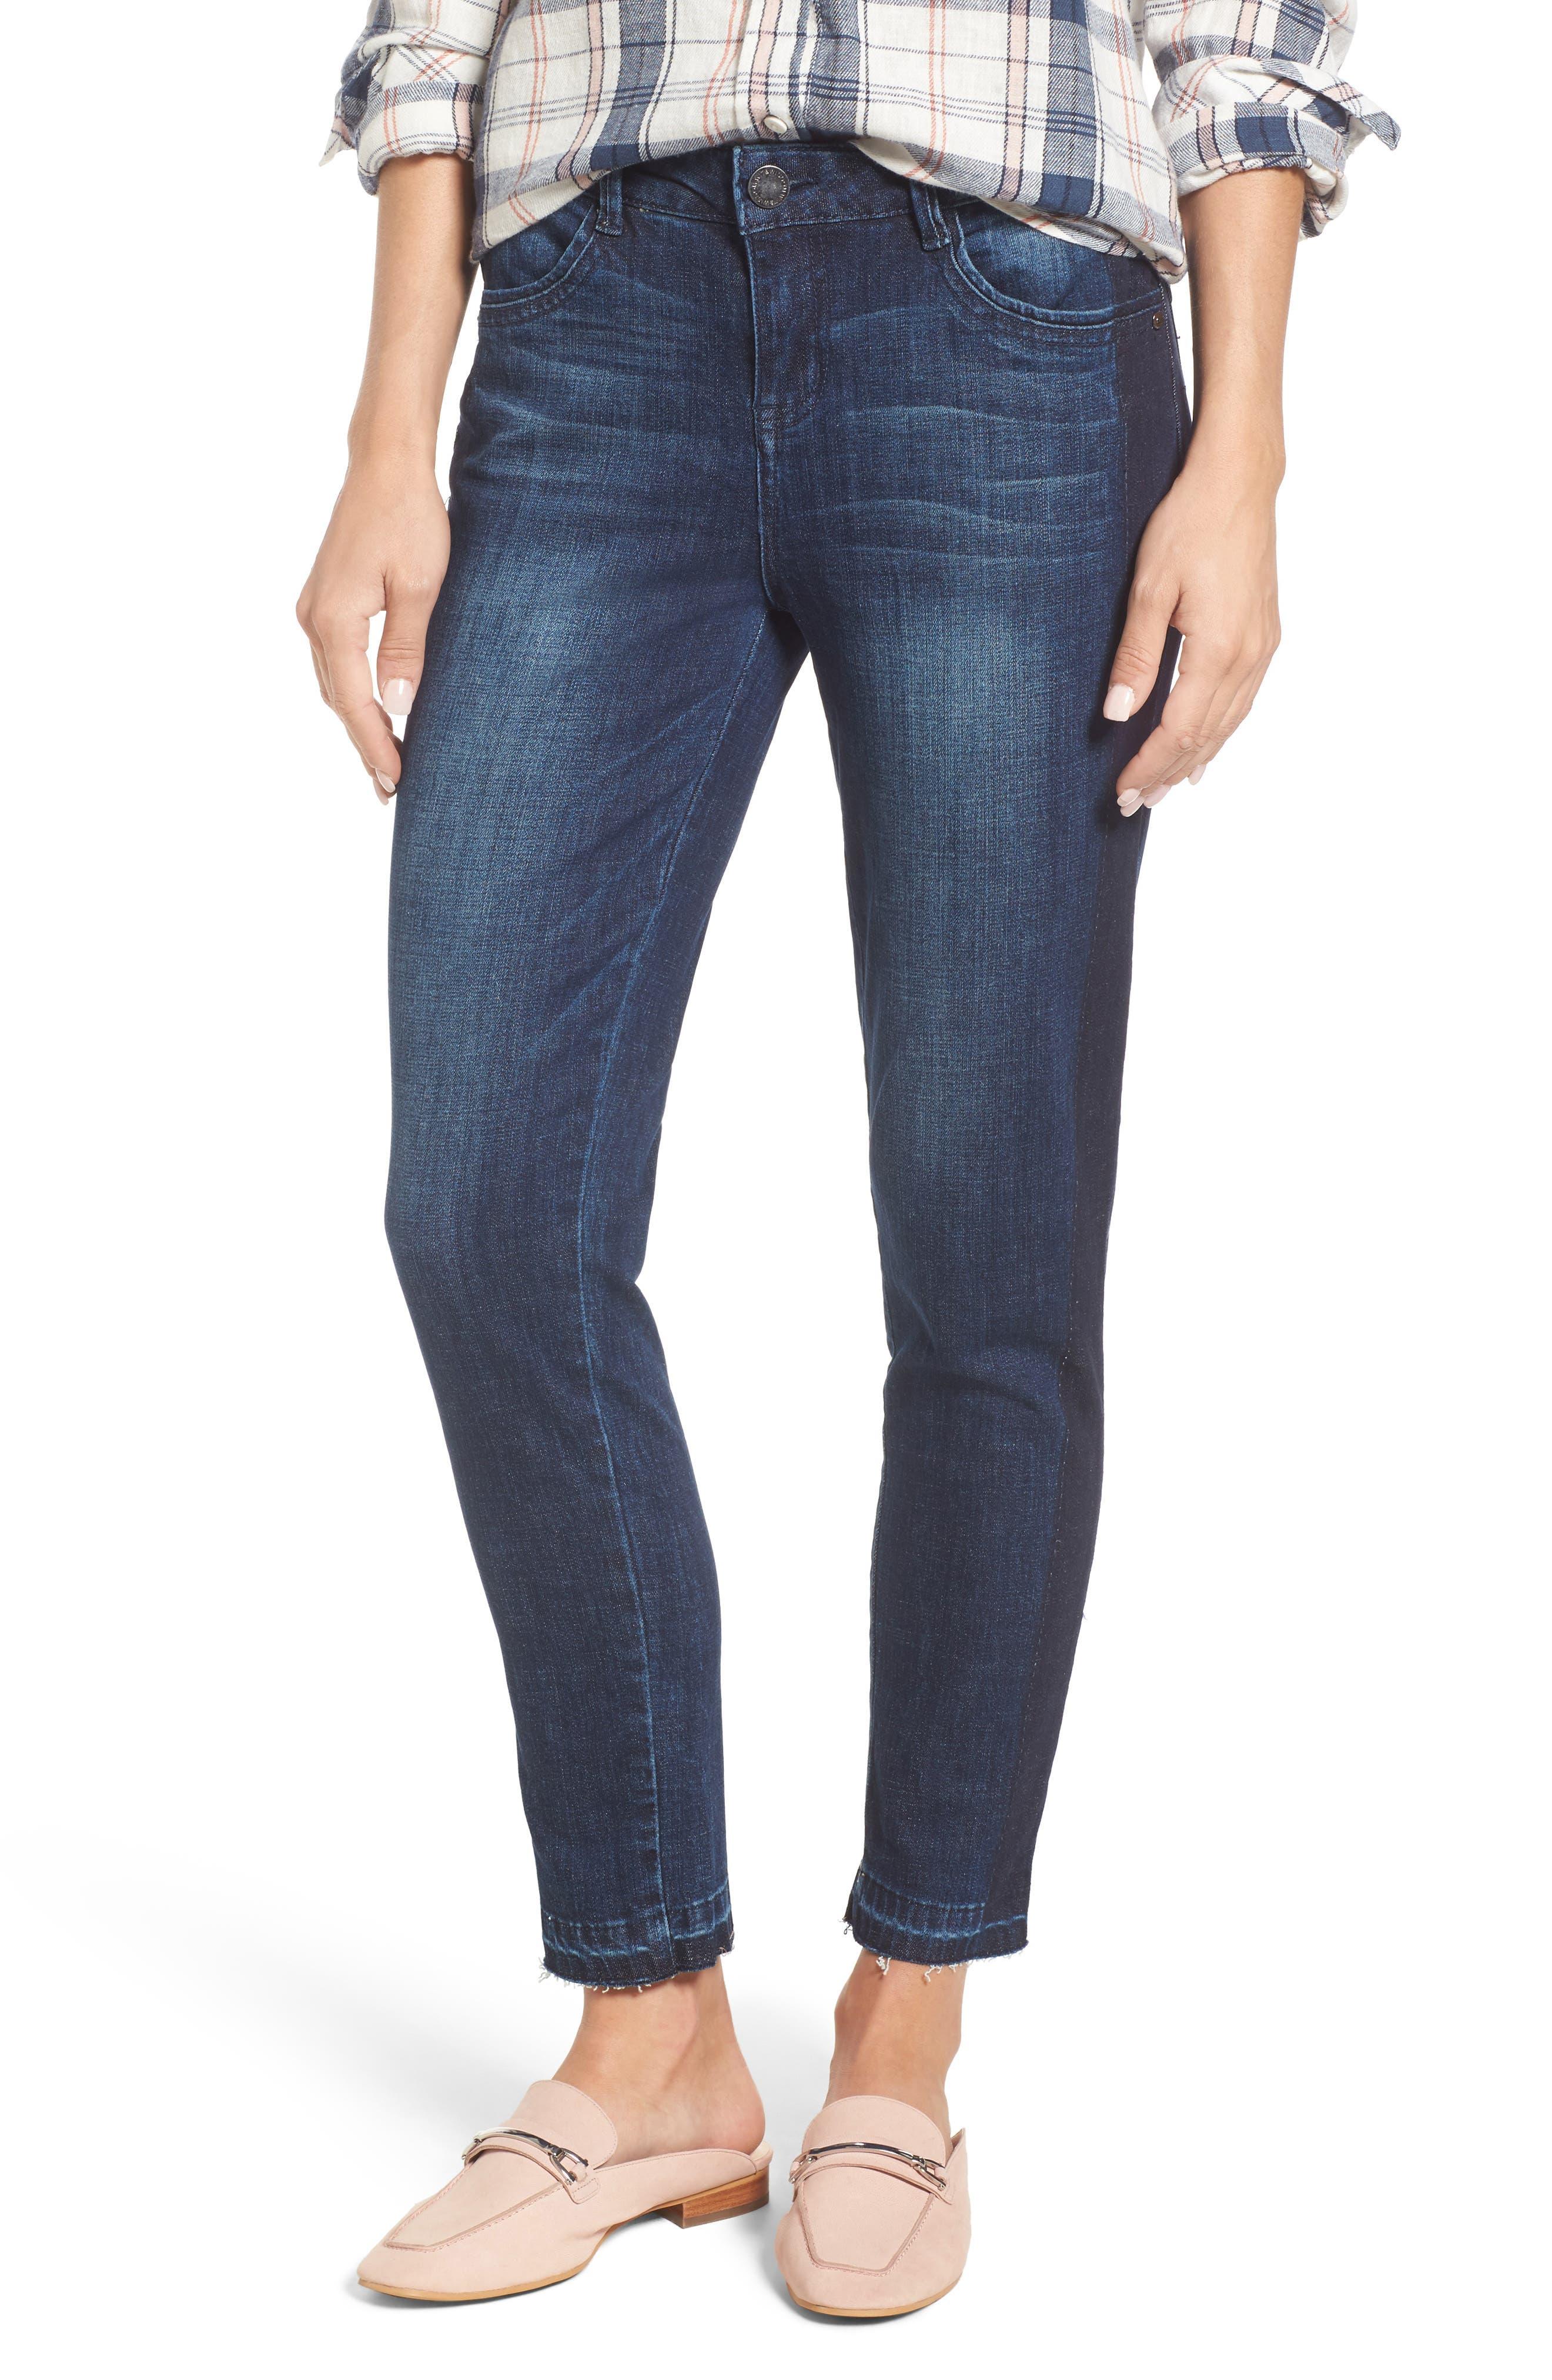 Main Image - Wit & Wisdom Tuxedo Stripe Skinny Jeans (Nordstrom Exclusive)